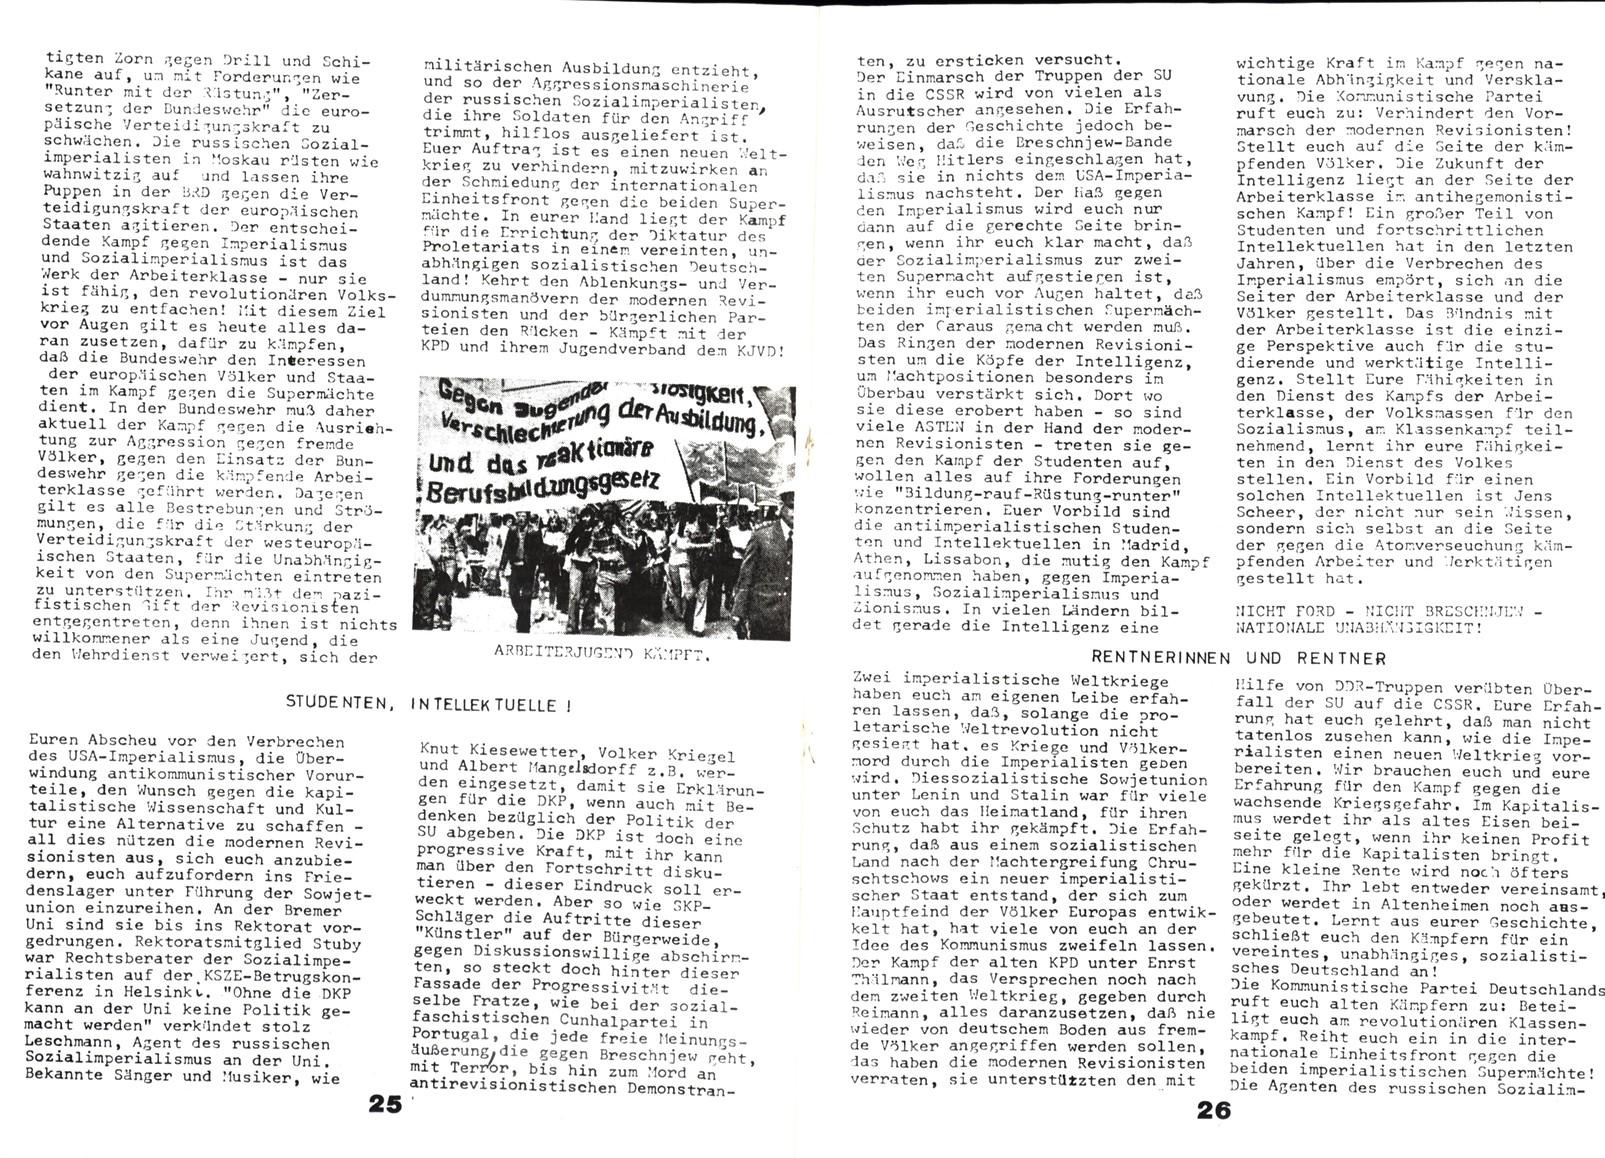 Bremen_KPDAO_1975_Buergerschaftswahl_14